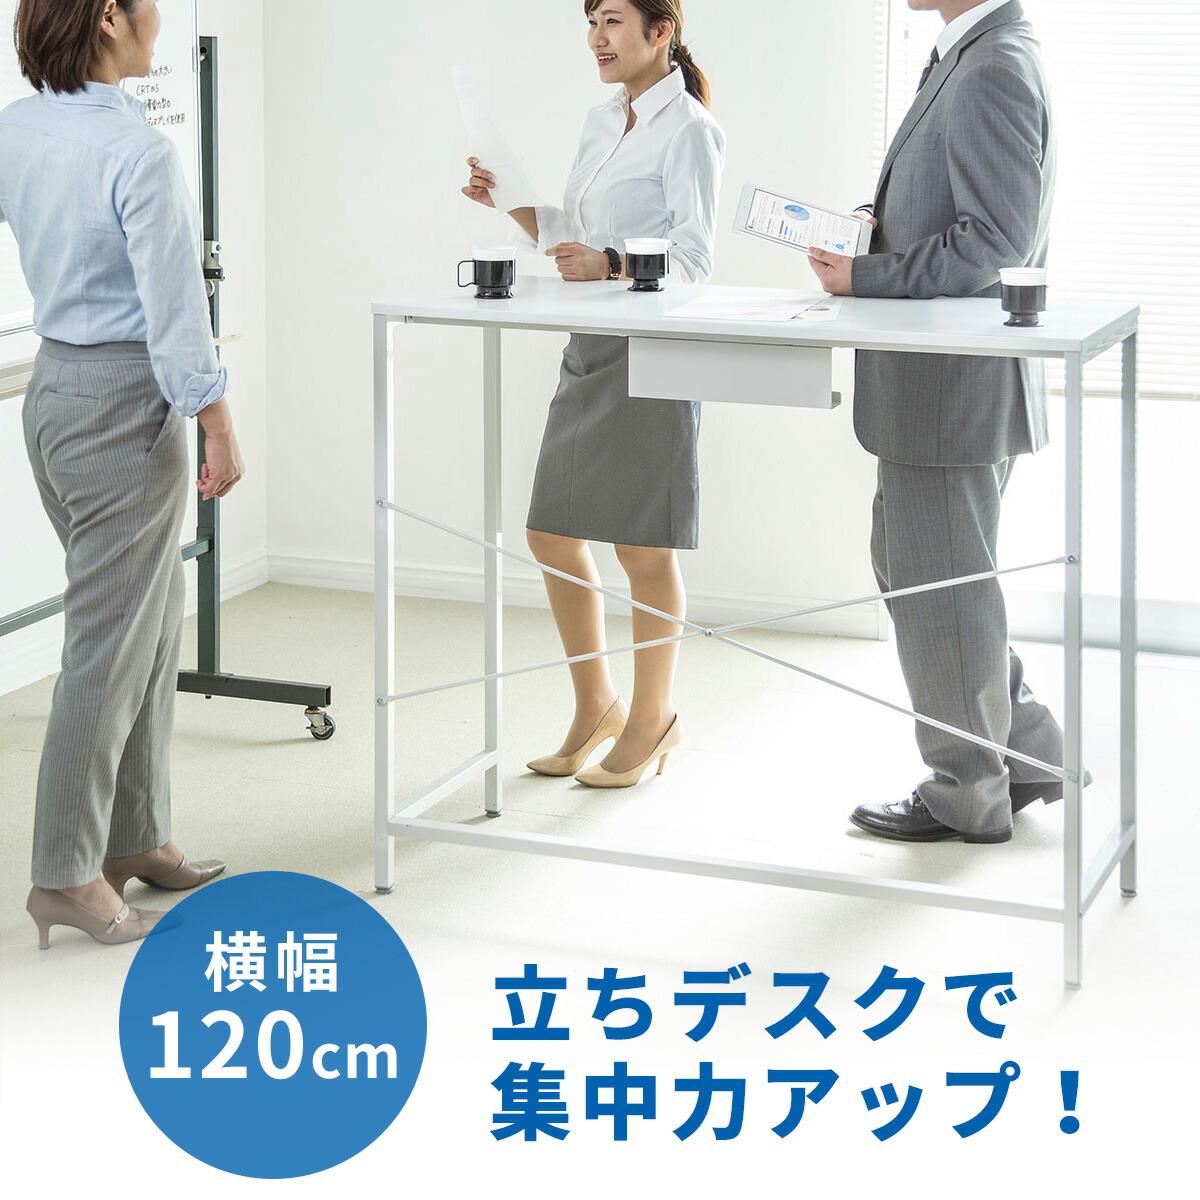 100-deskf010の画像